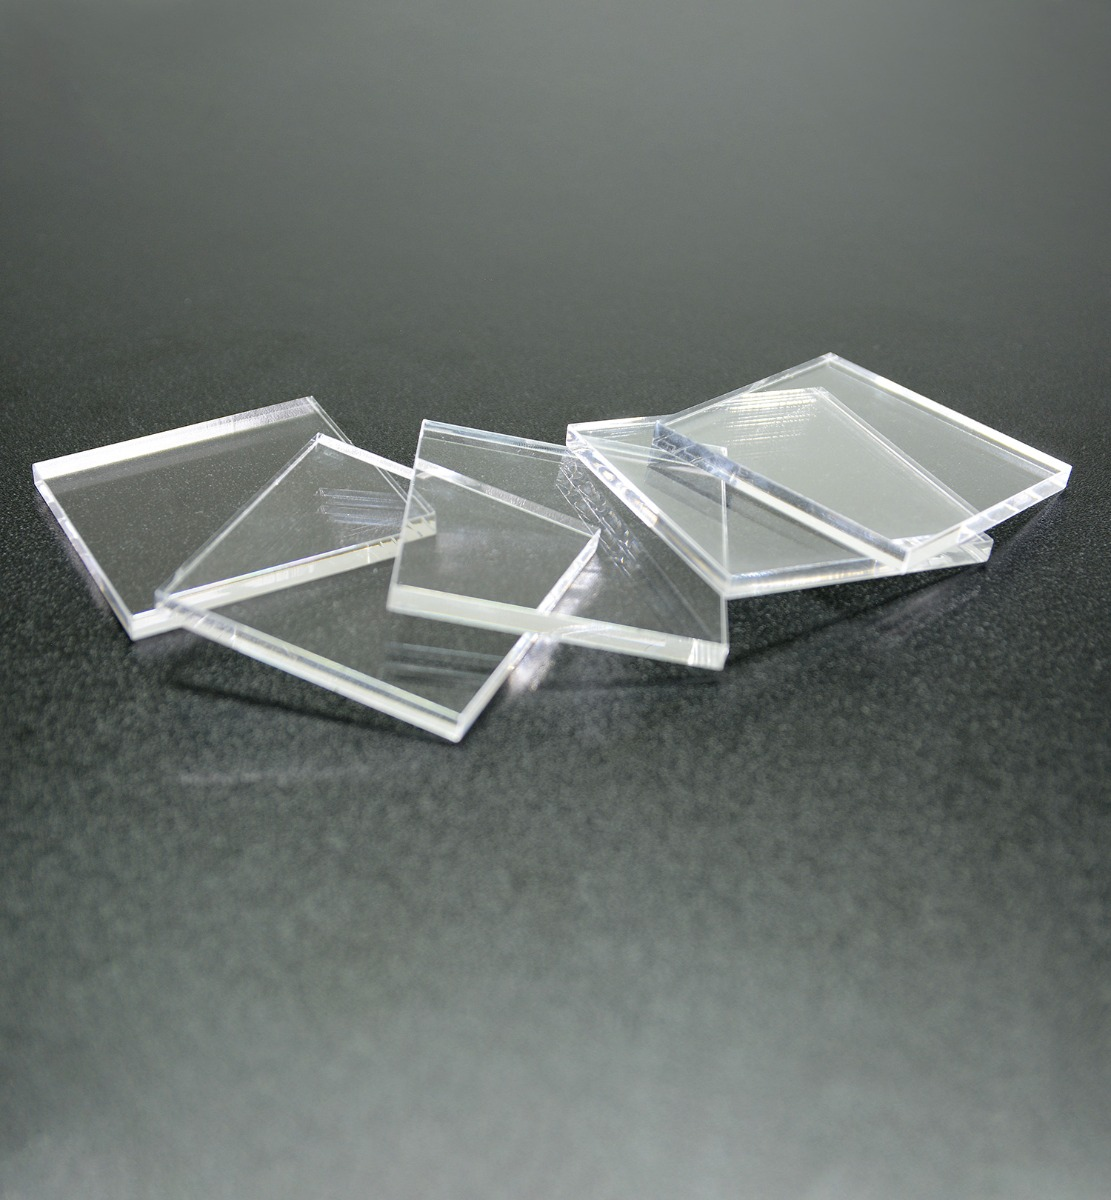 Acrylglasplatte - Live